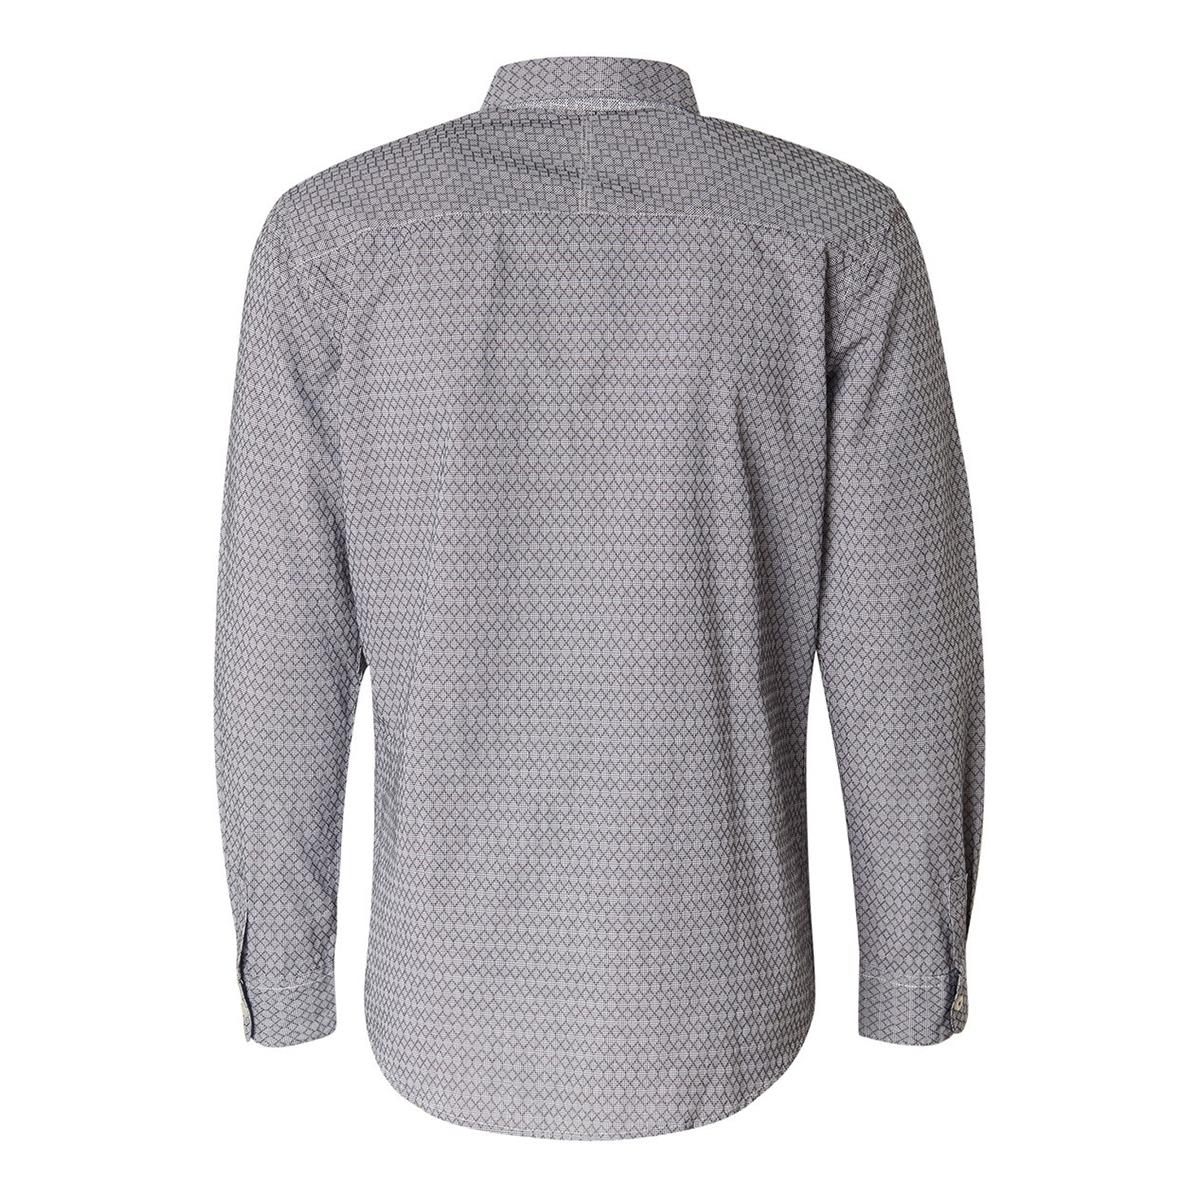 overhemd met patroon 1014475xx10 tom tailor overhemd 20175